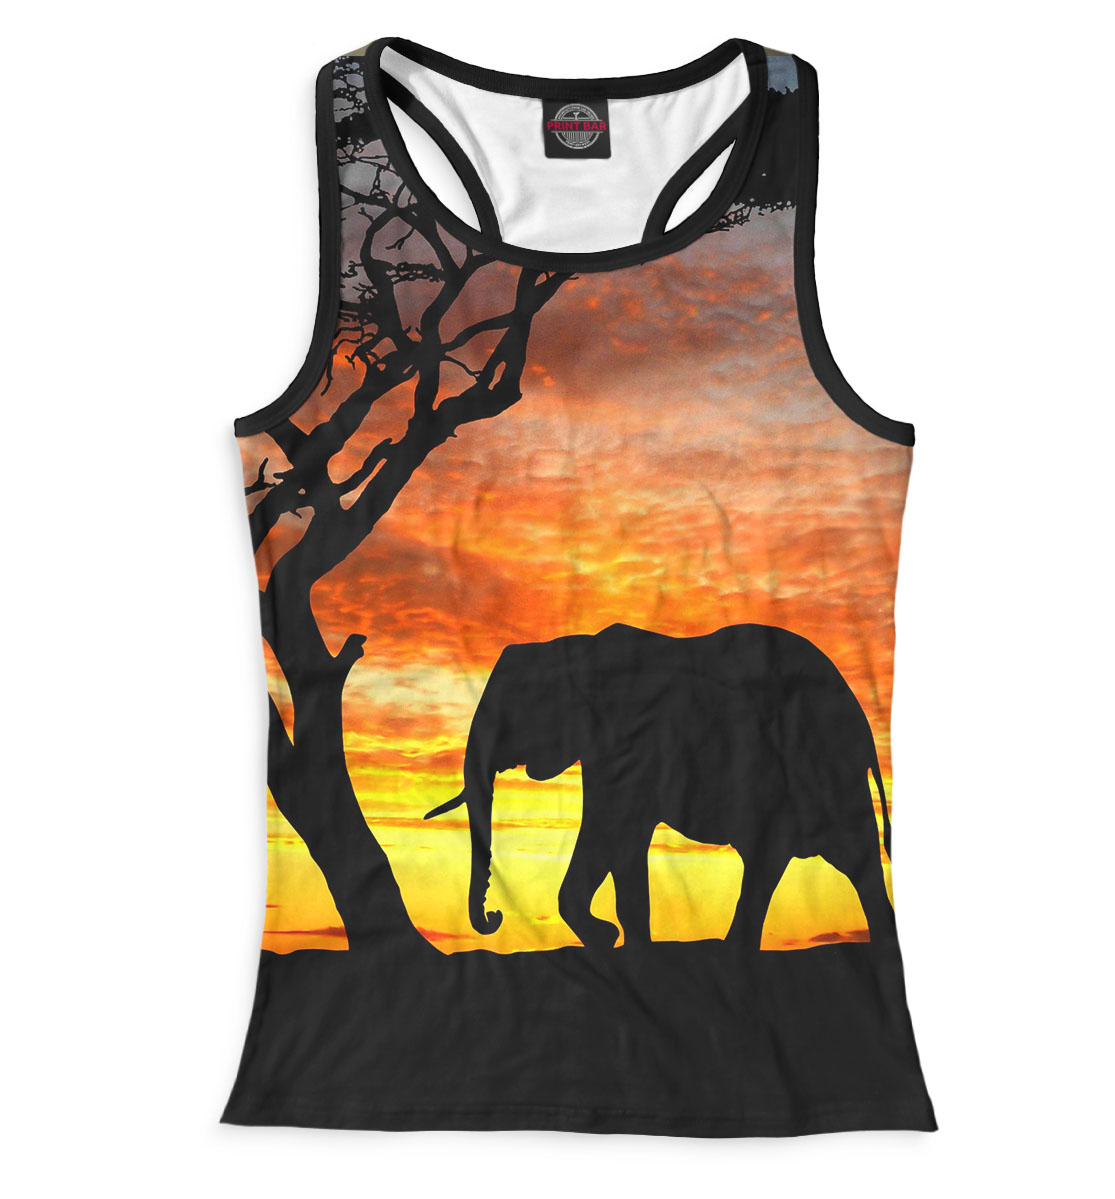 Купить Слоны, Printbar, Майки борцовки, SLO-280380-mayb-1